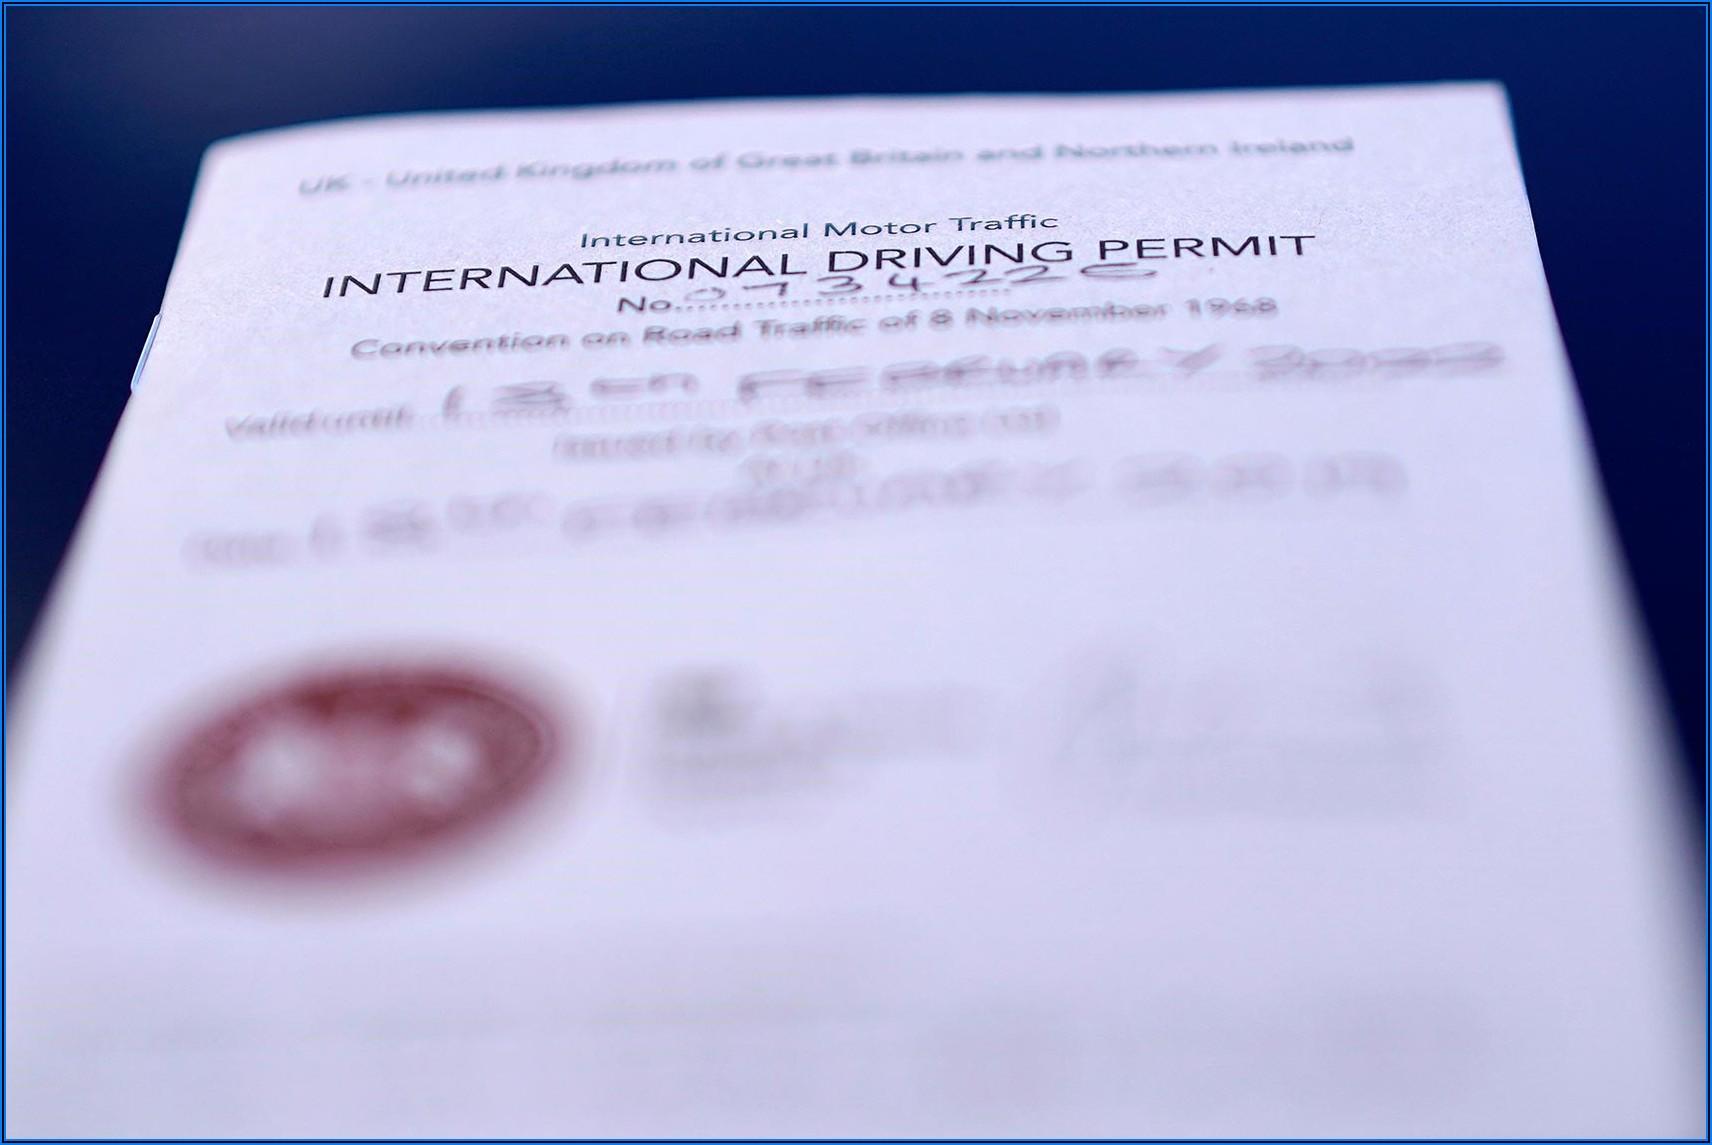 International Driving Licence Application Form Ireland